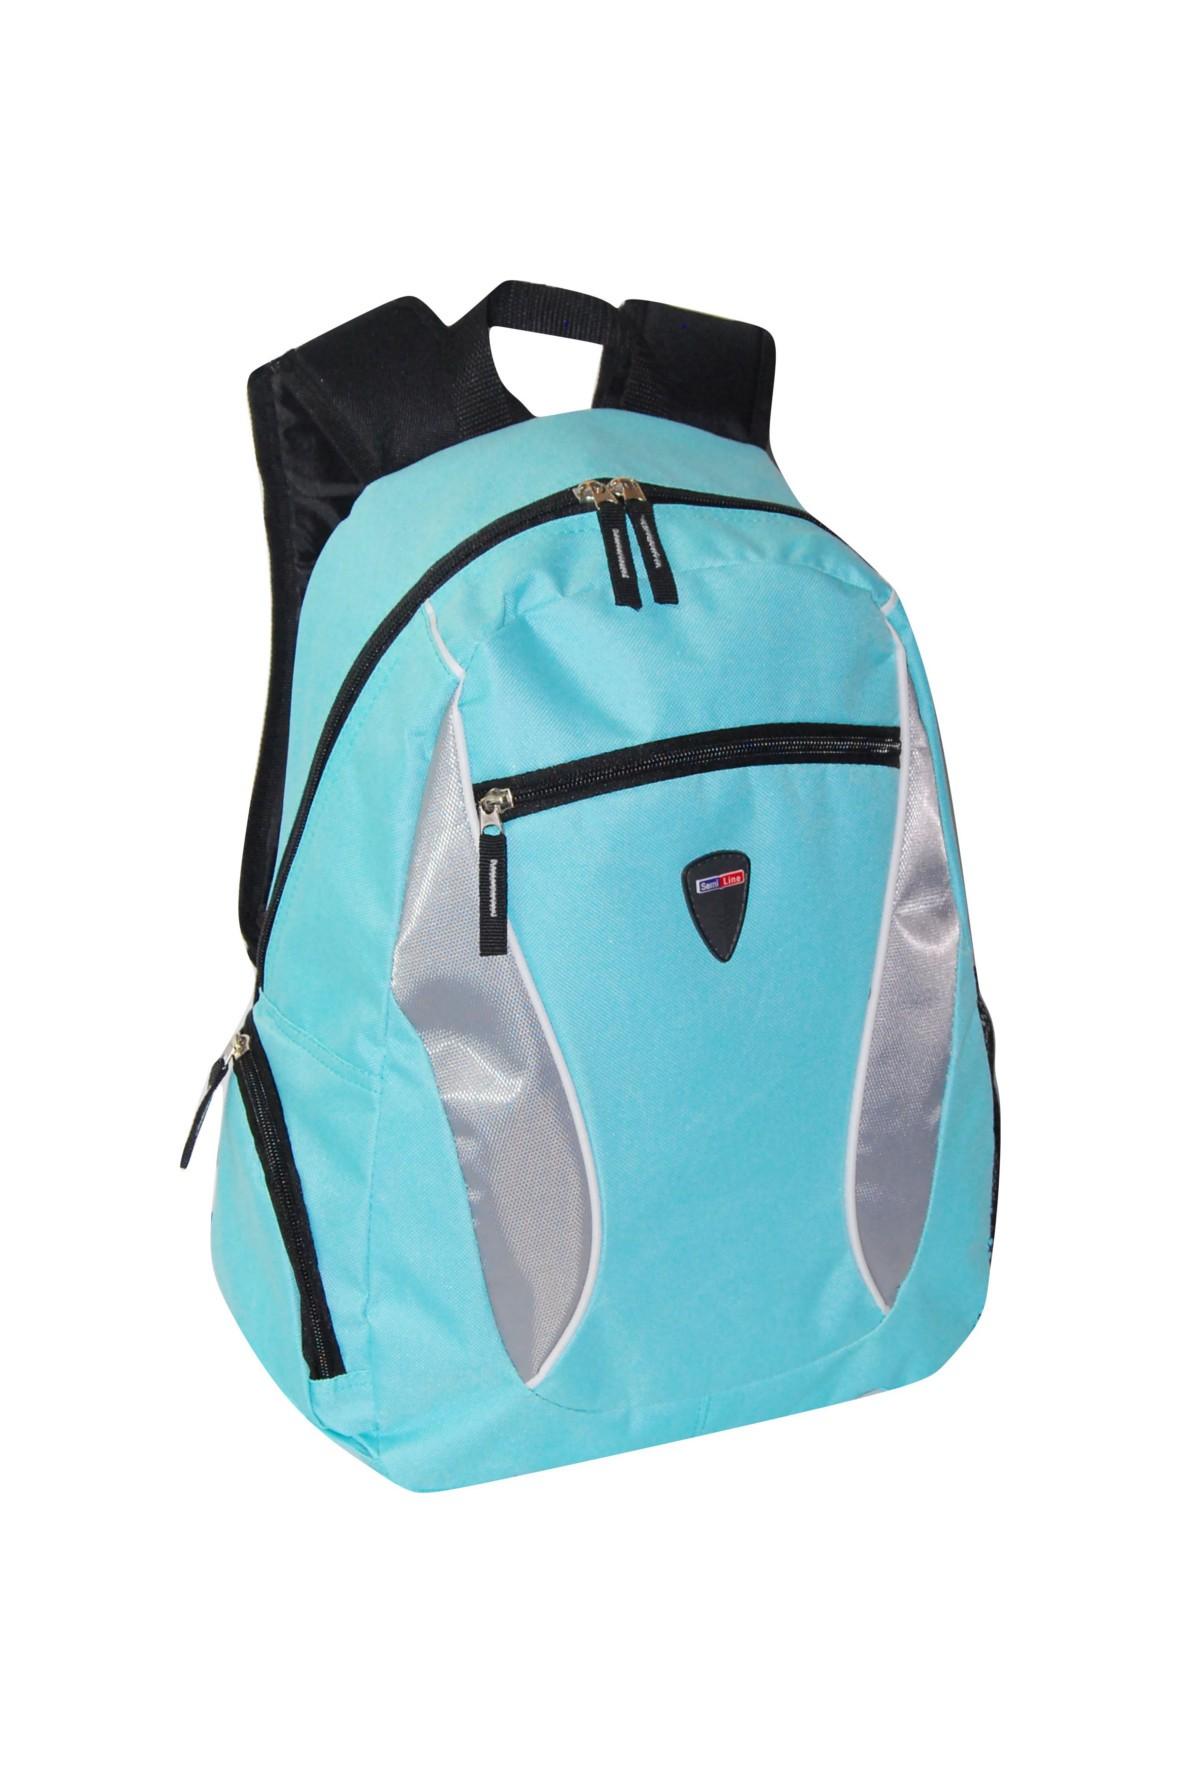 Plecak SemiLine- niebieski